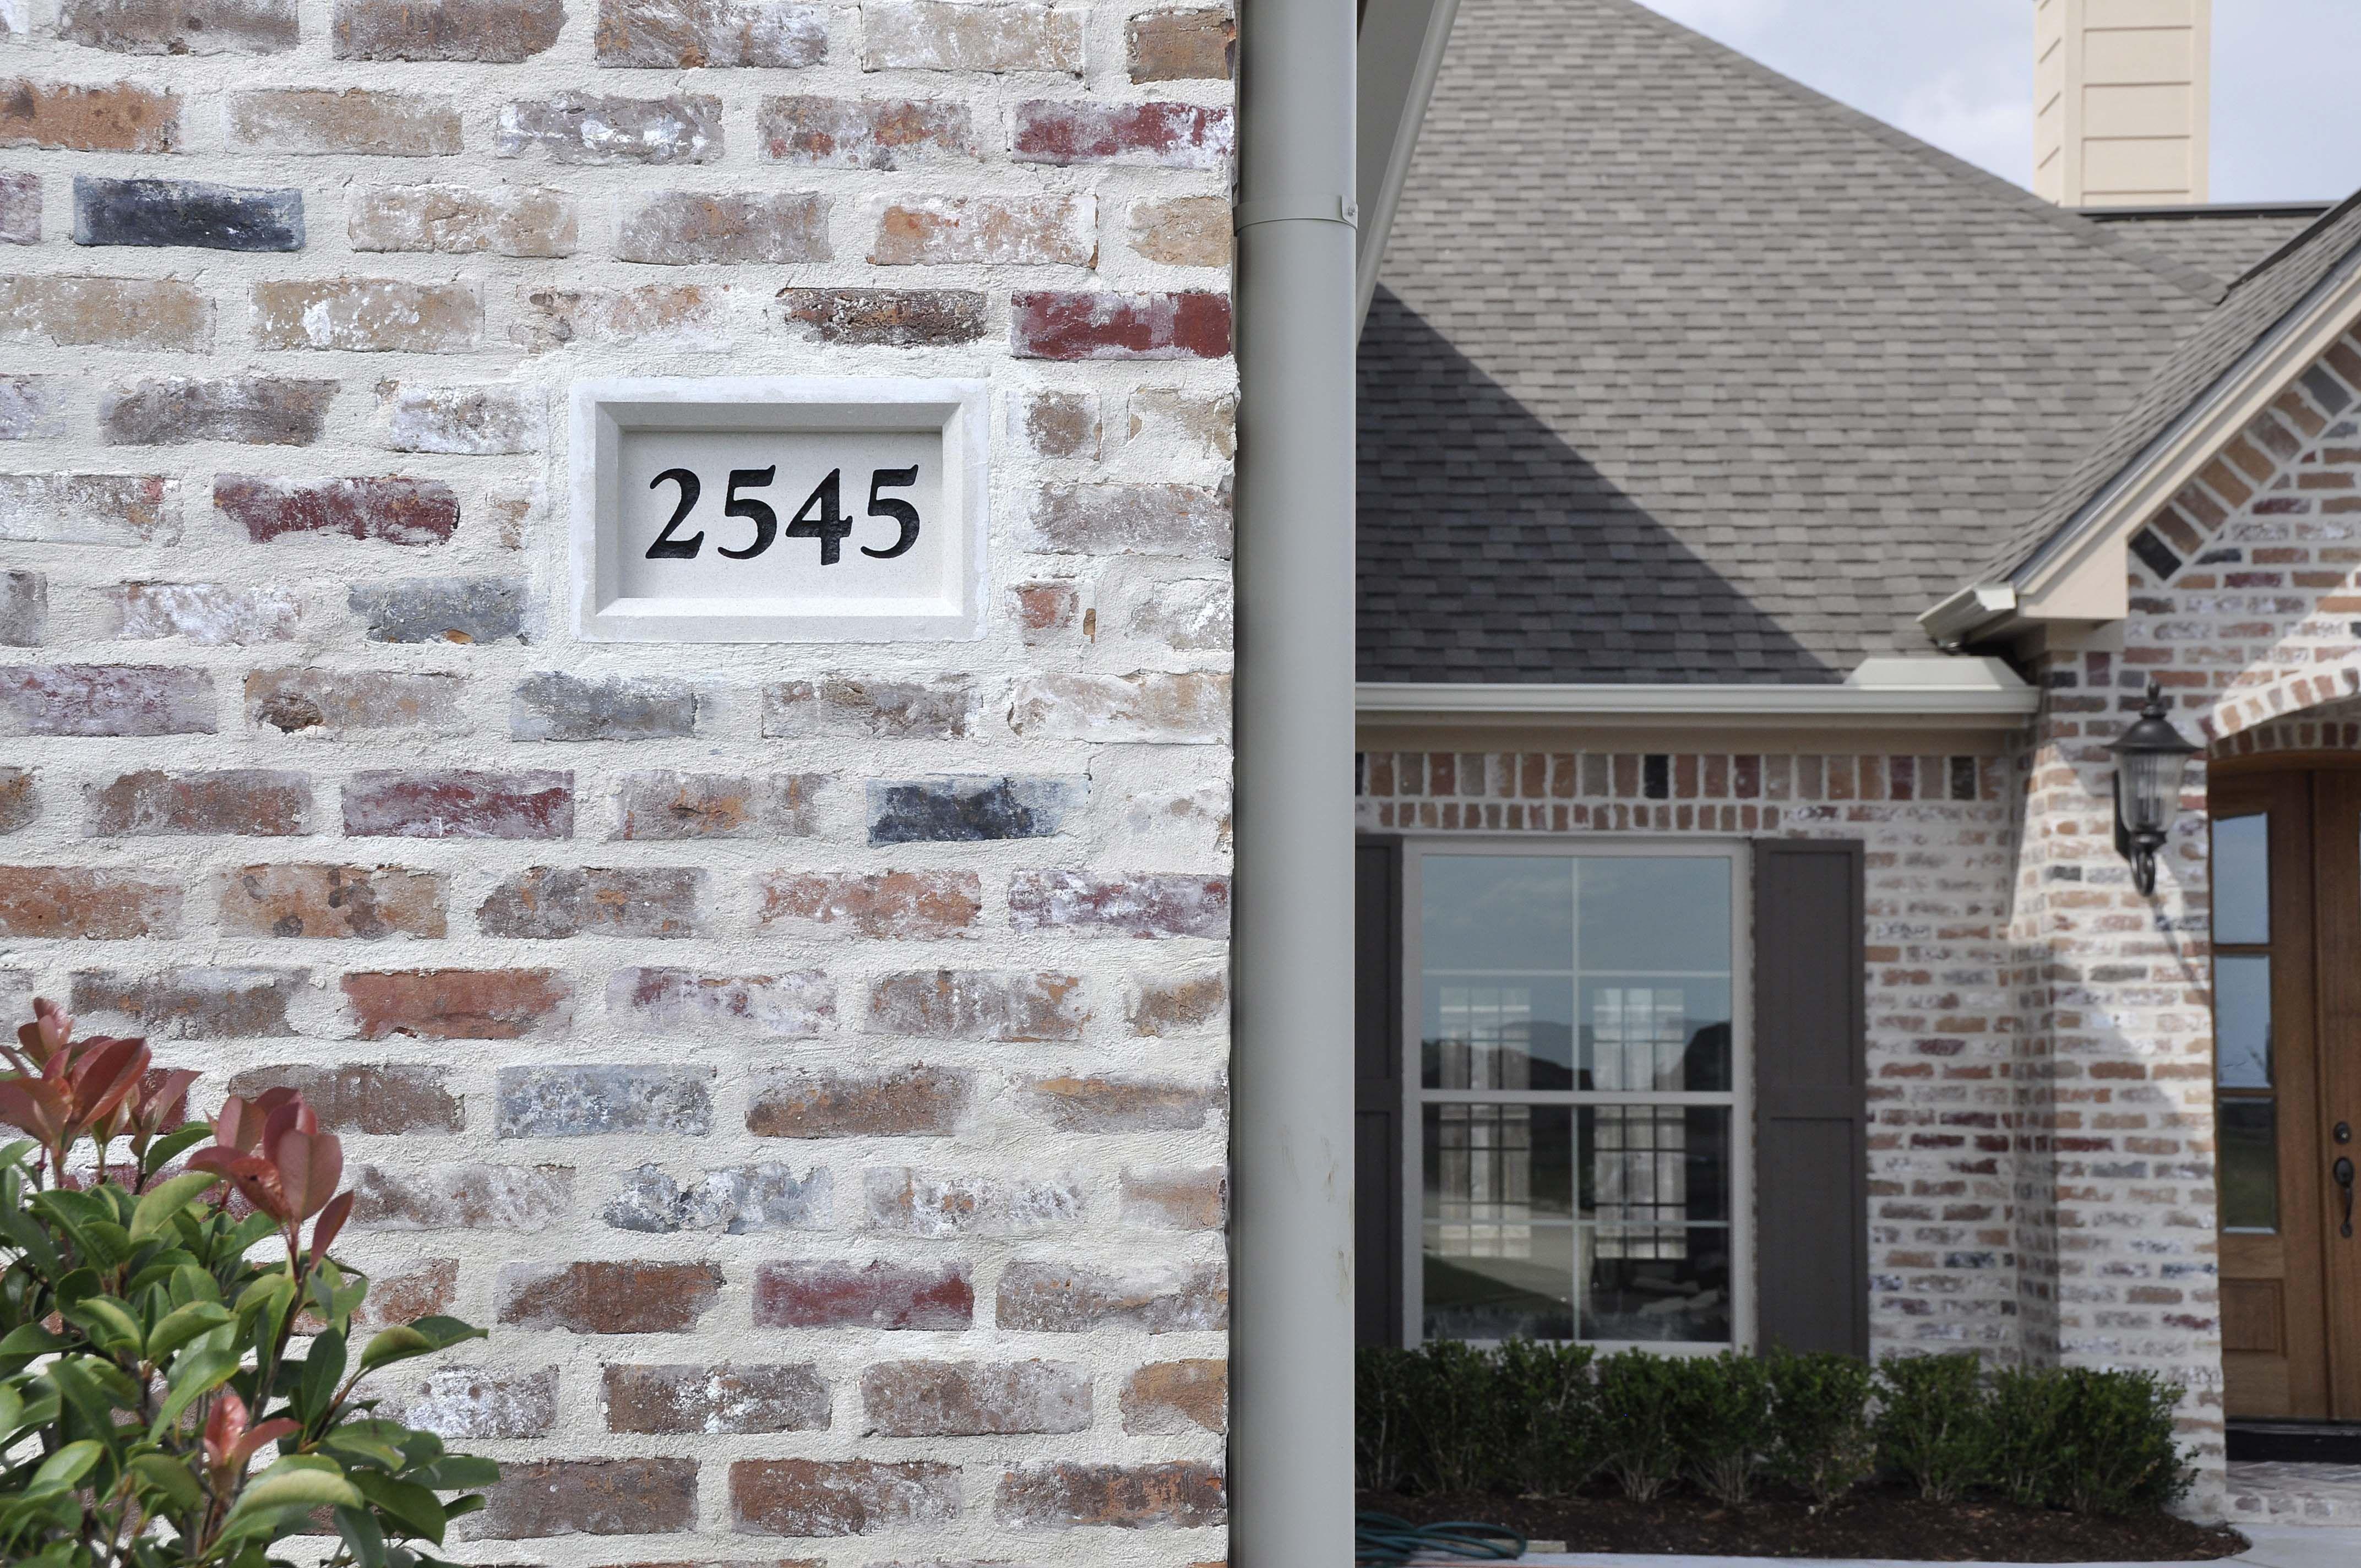 Old Texas Brick Brick Exterior House House Exterior Red Brick Exteriors